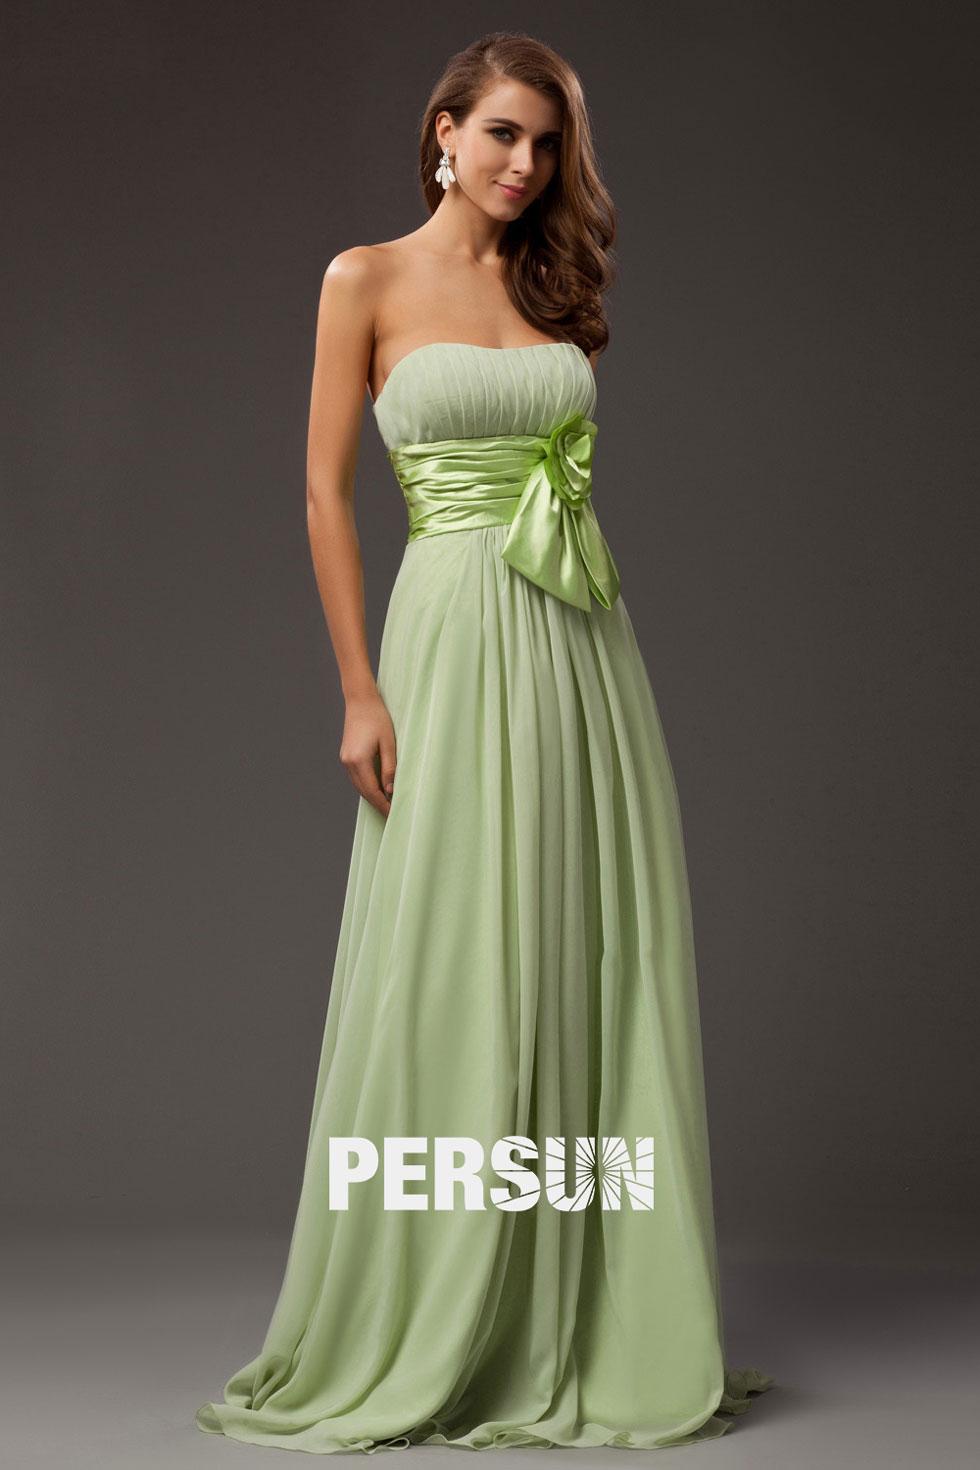 robe verte pastel pour invitée mariage